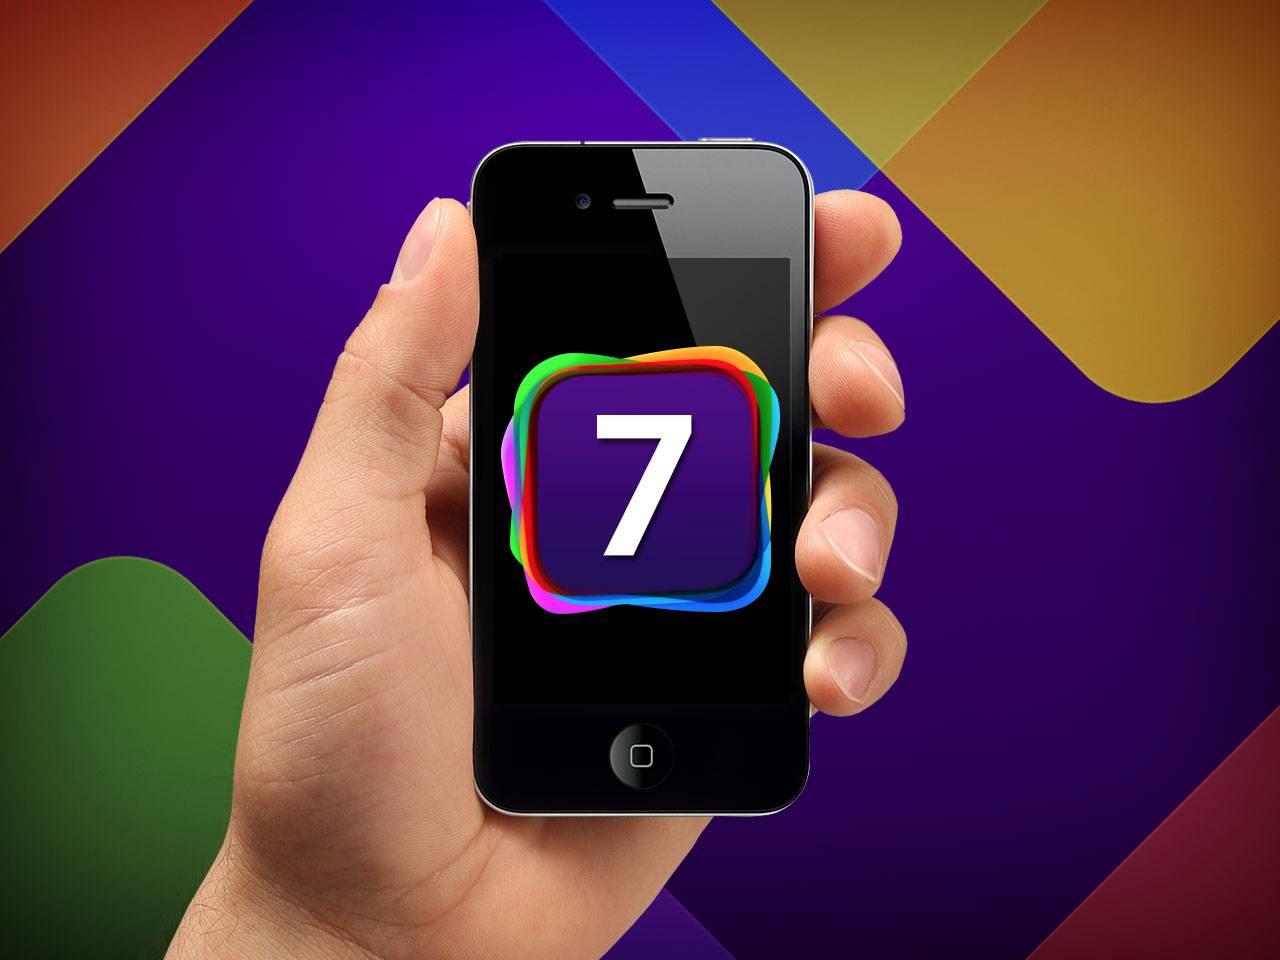 iOS-7-on-iPhone-4S-WWDC-2013